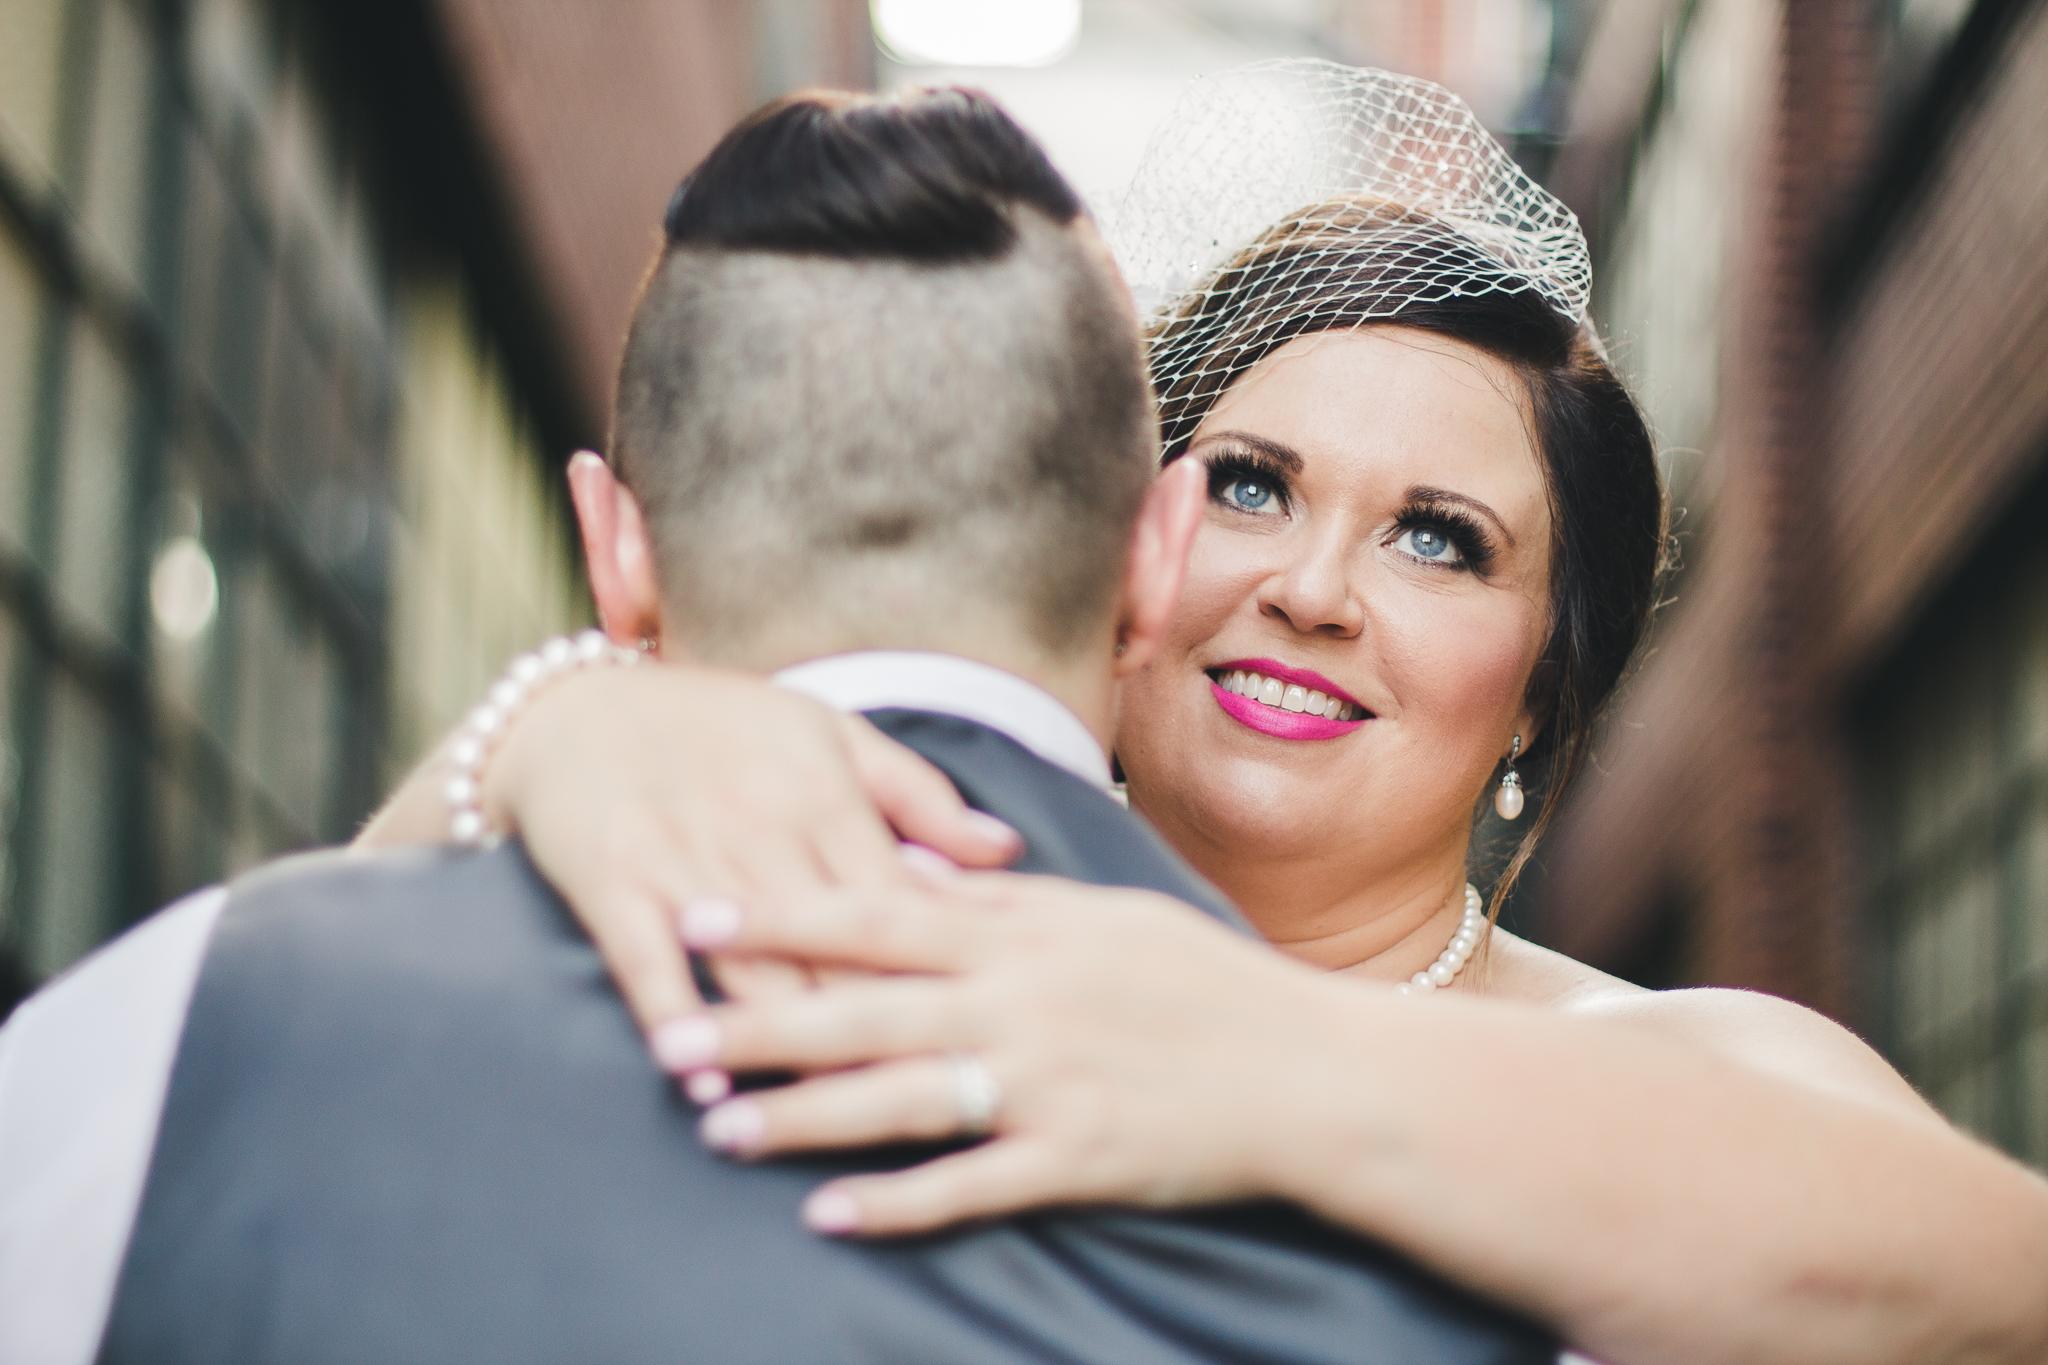 Richmond Kentucky Wedding Photographer - Ariana Jordan Photography -25-2.jpg